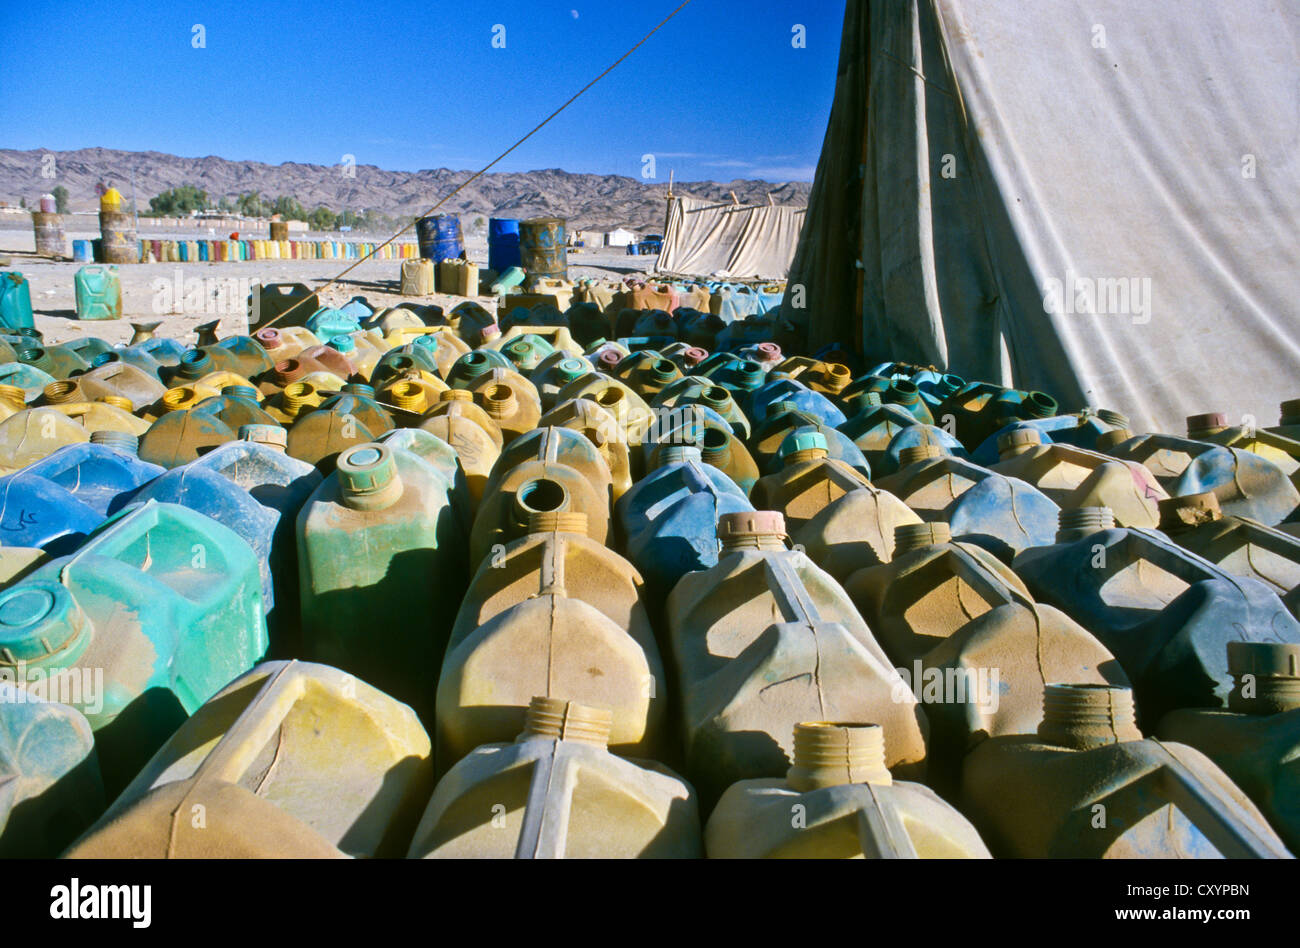 Petrol station selling smuggled petrol from Iran to truck drivers in Pakistan, Noshki, Belouchistan, Pakistan, Asia Stock Photo